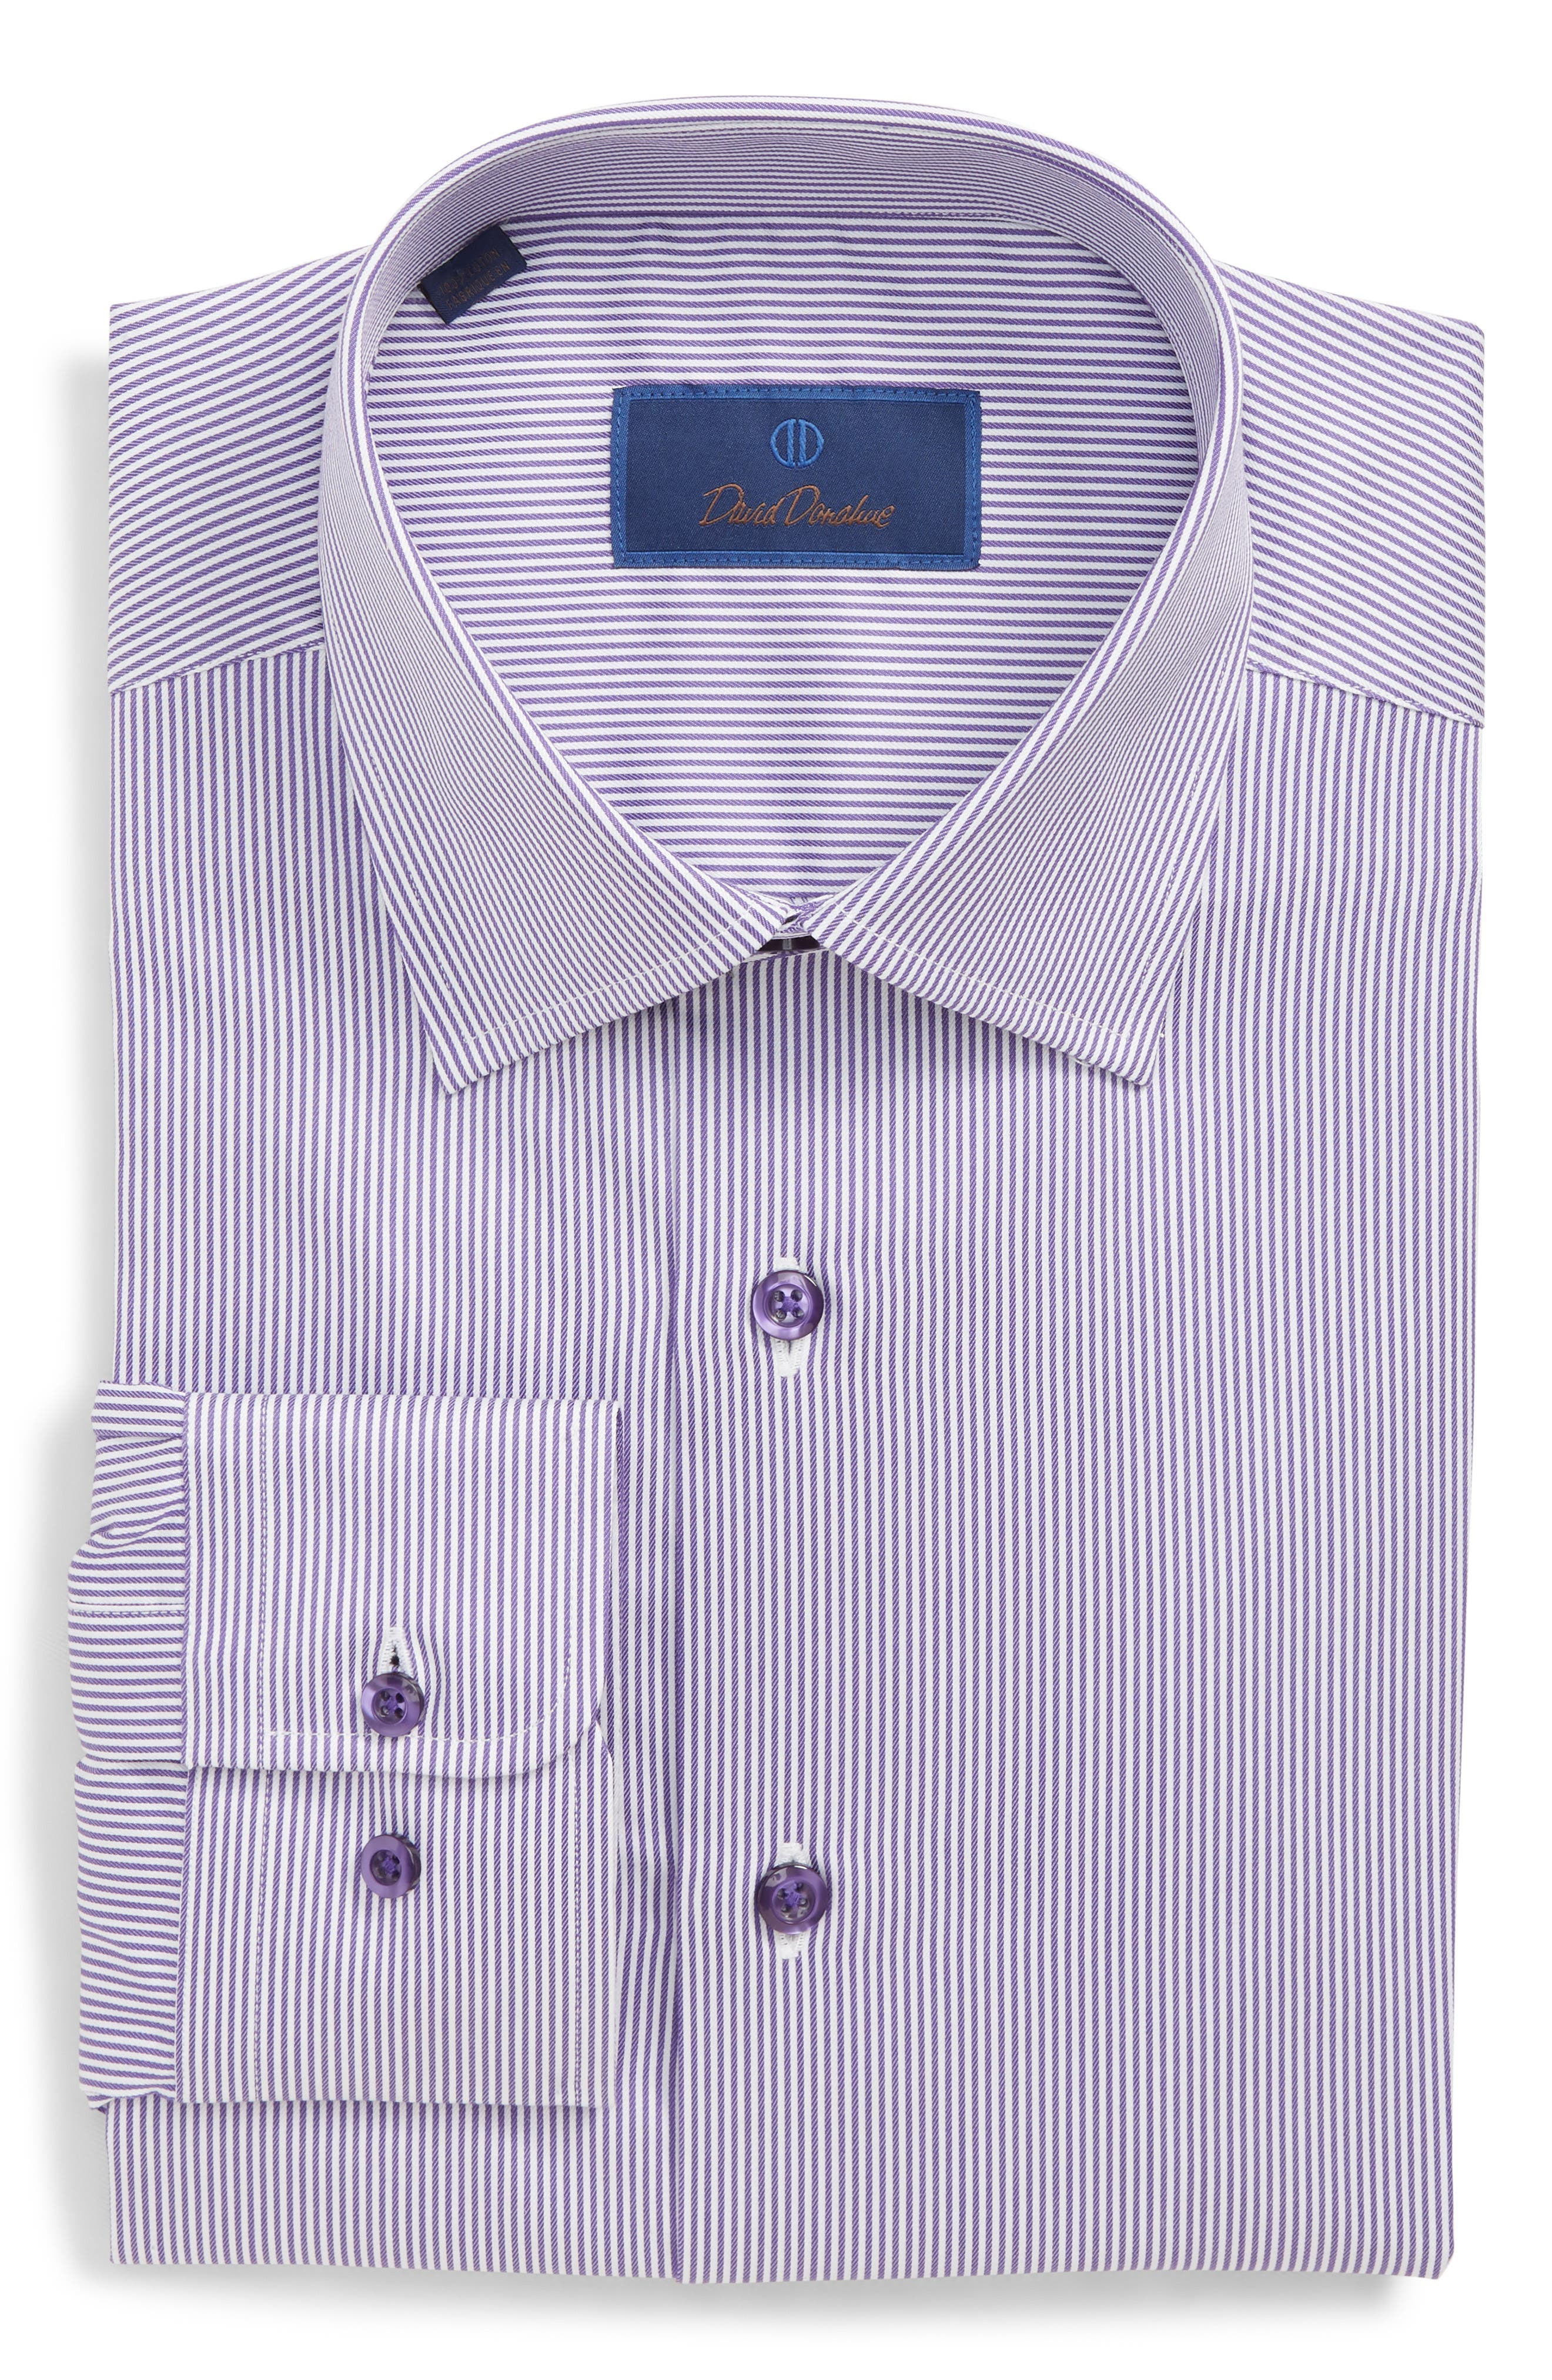 Regular Fit Stripe Dress Shirt,                         Main,                         color, 500